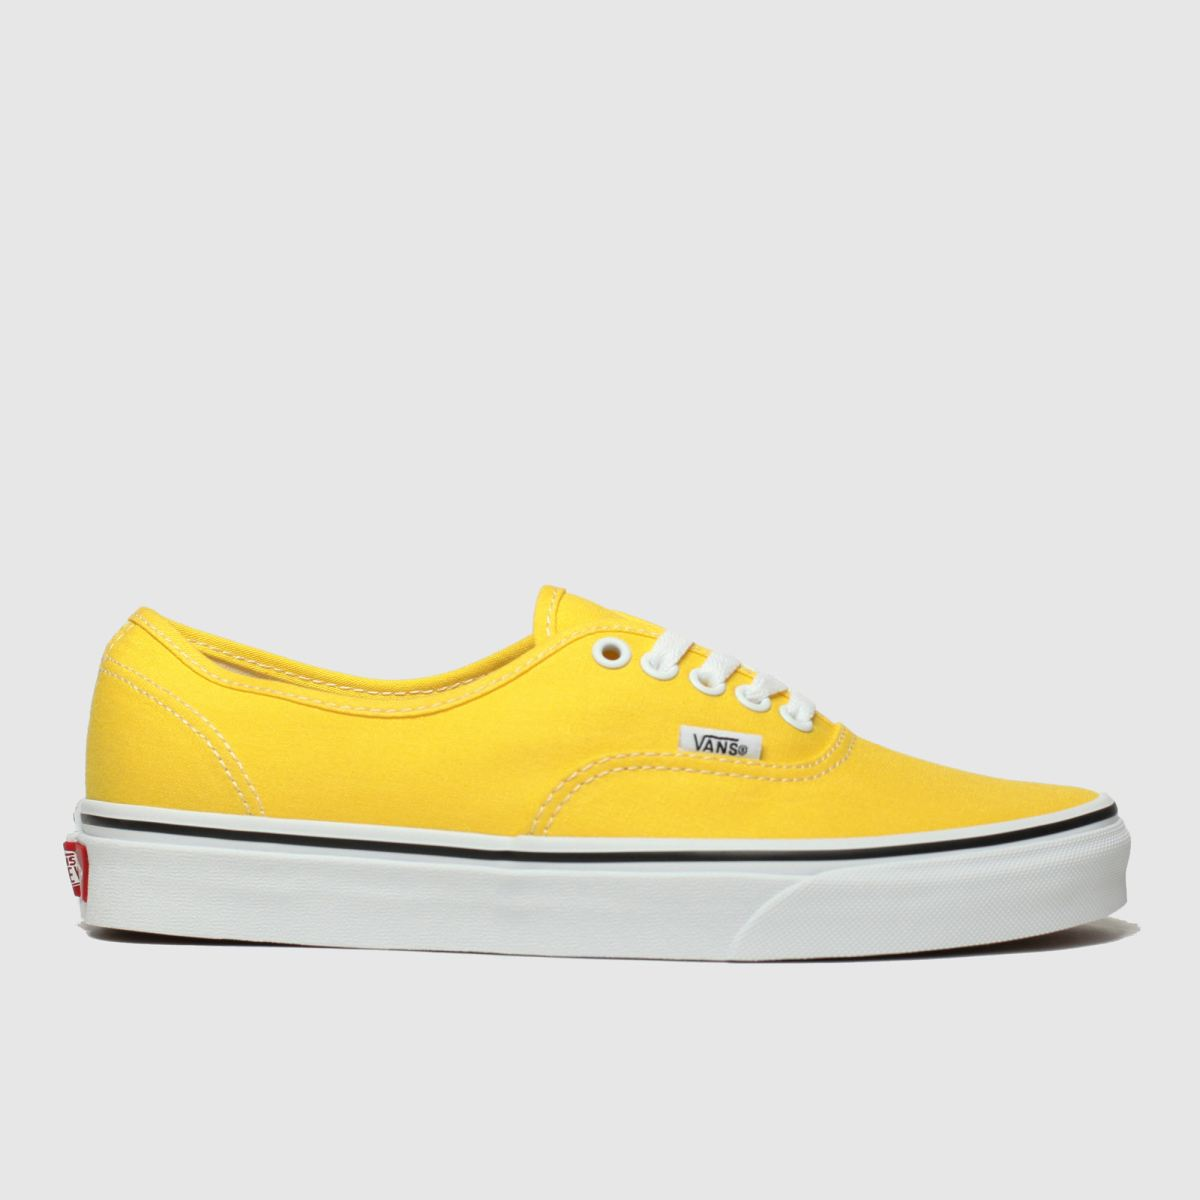 Vans Yellow Authentic Trainers